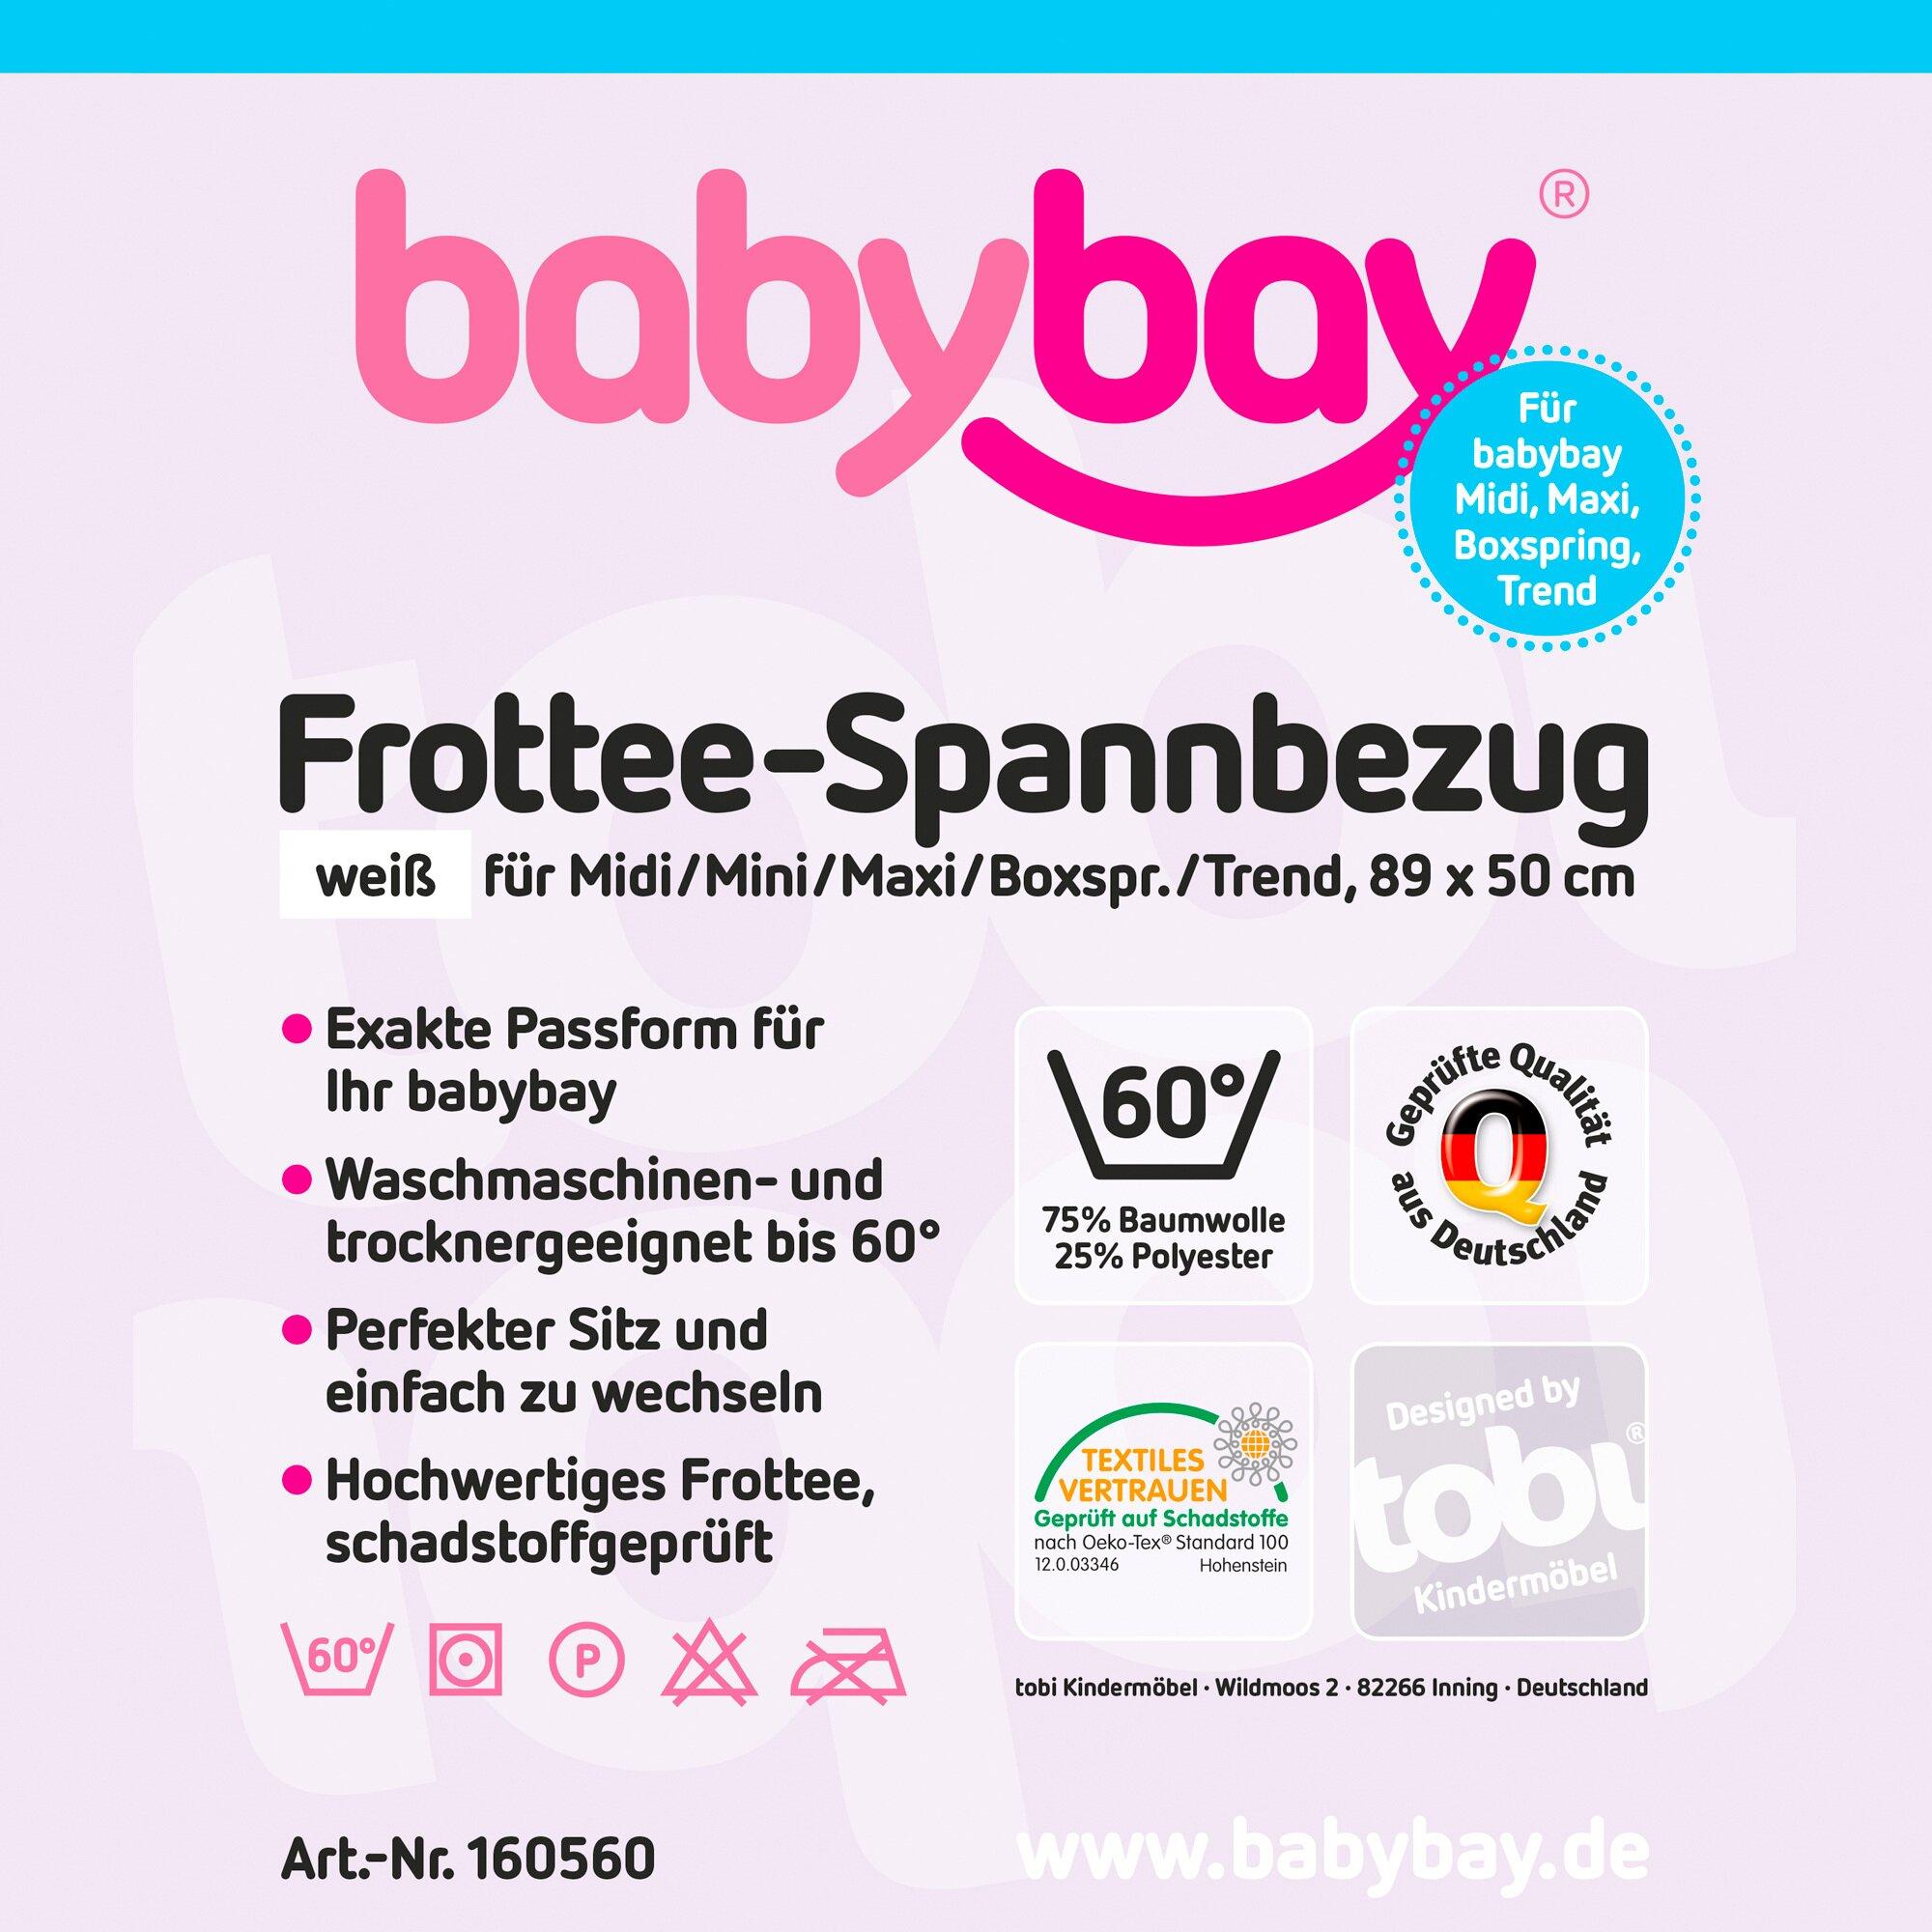 babybay-frottee-spannbetttuch-maxi-89x50-cm-weiss